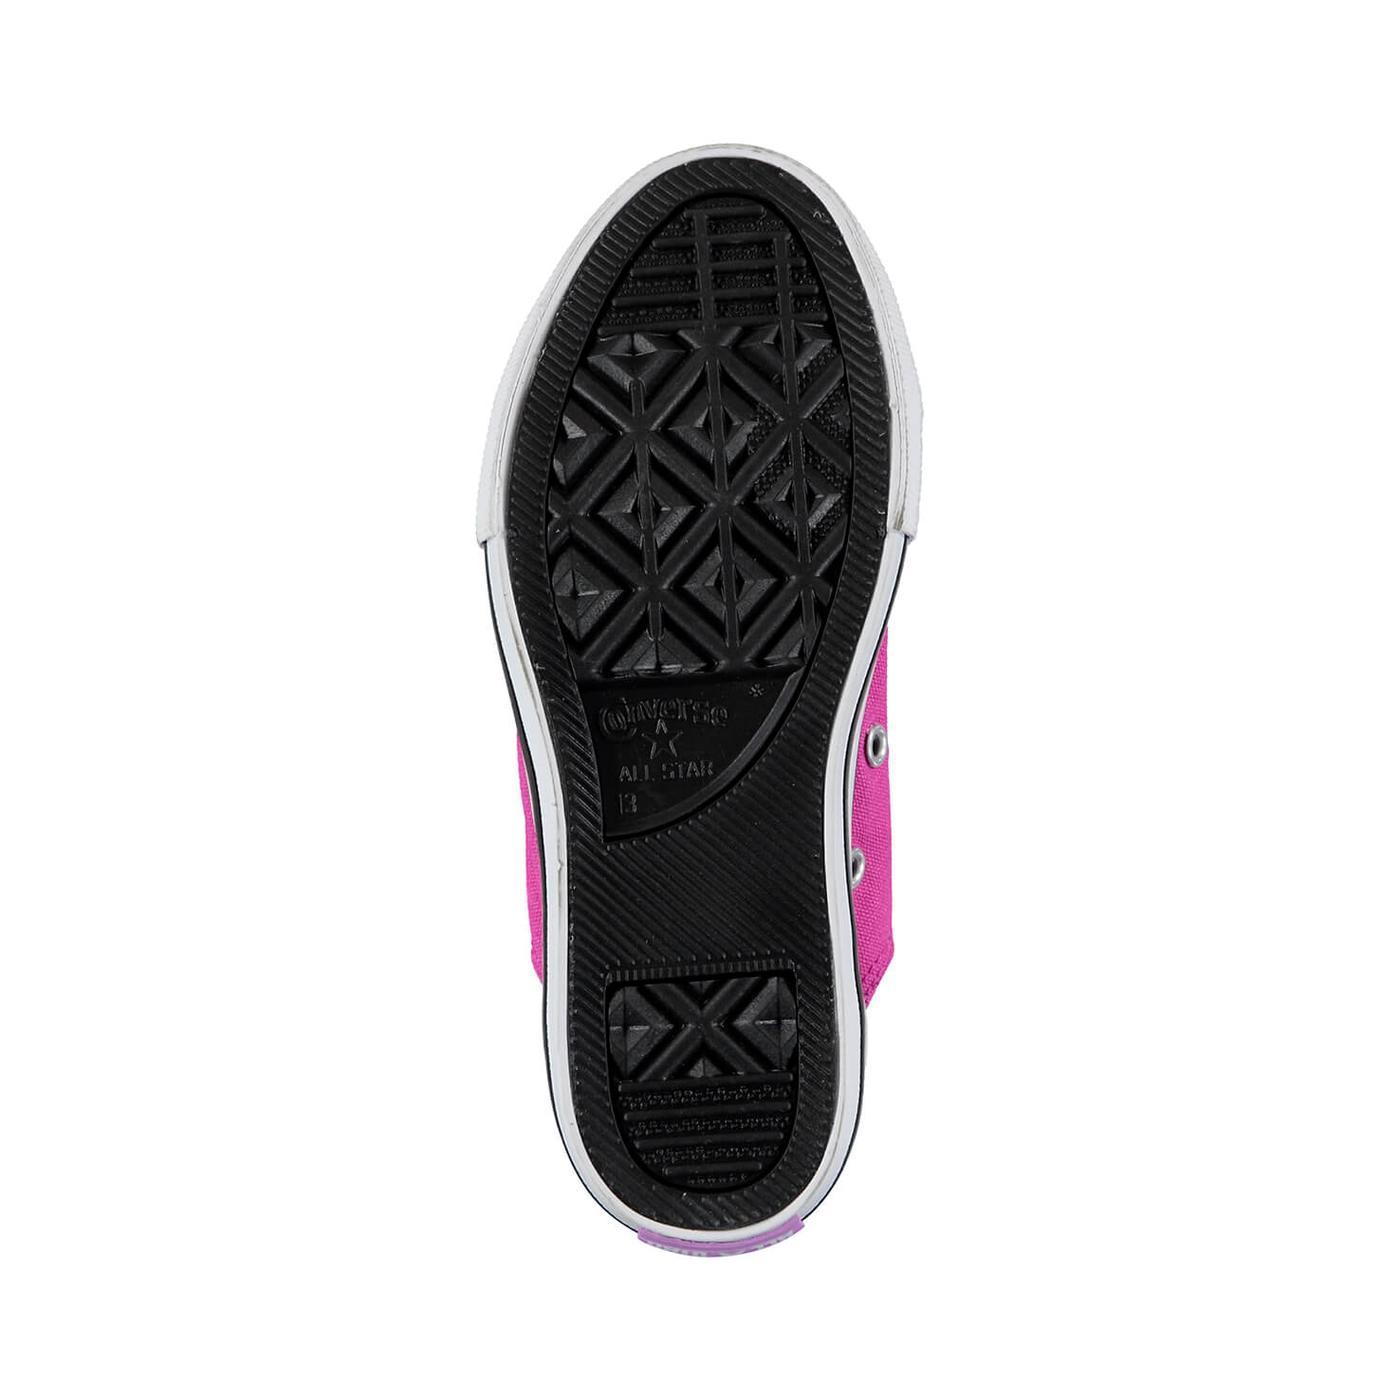 Converse Chuck Taylor All Star Çoçuk Pembe Sneaker